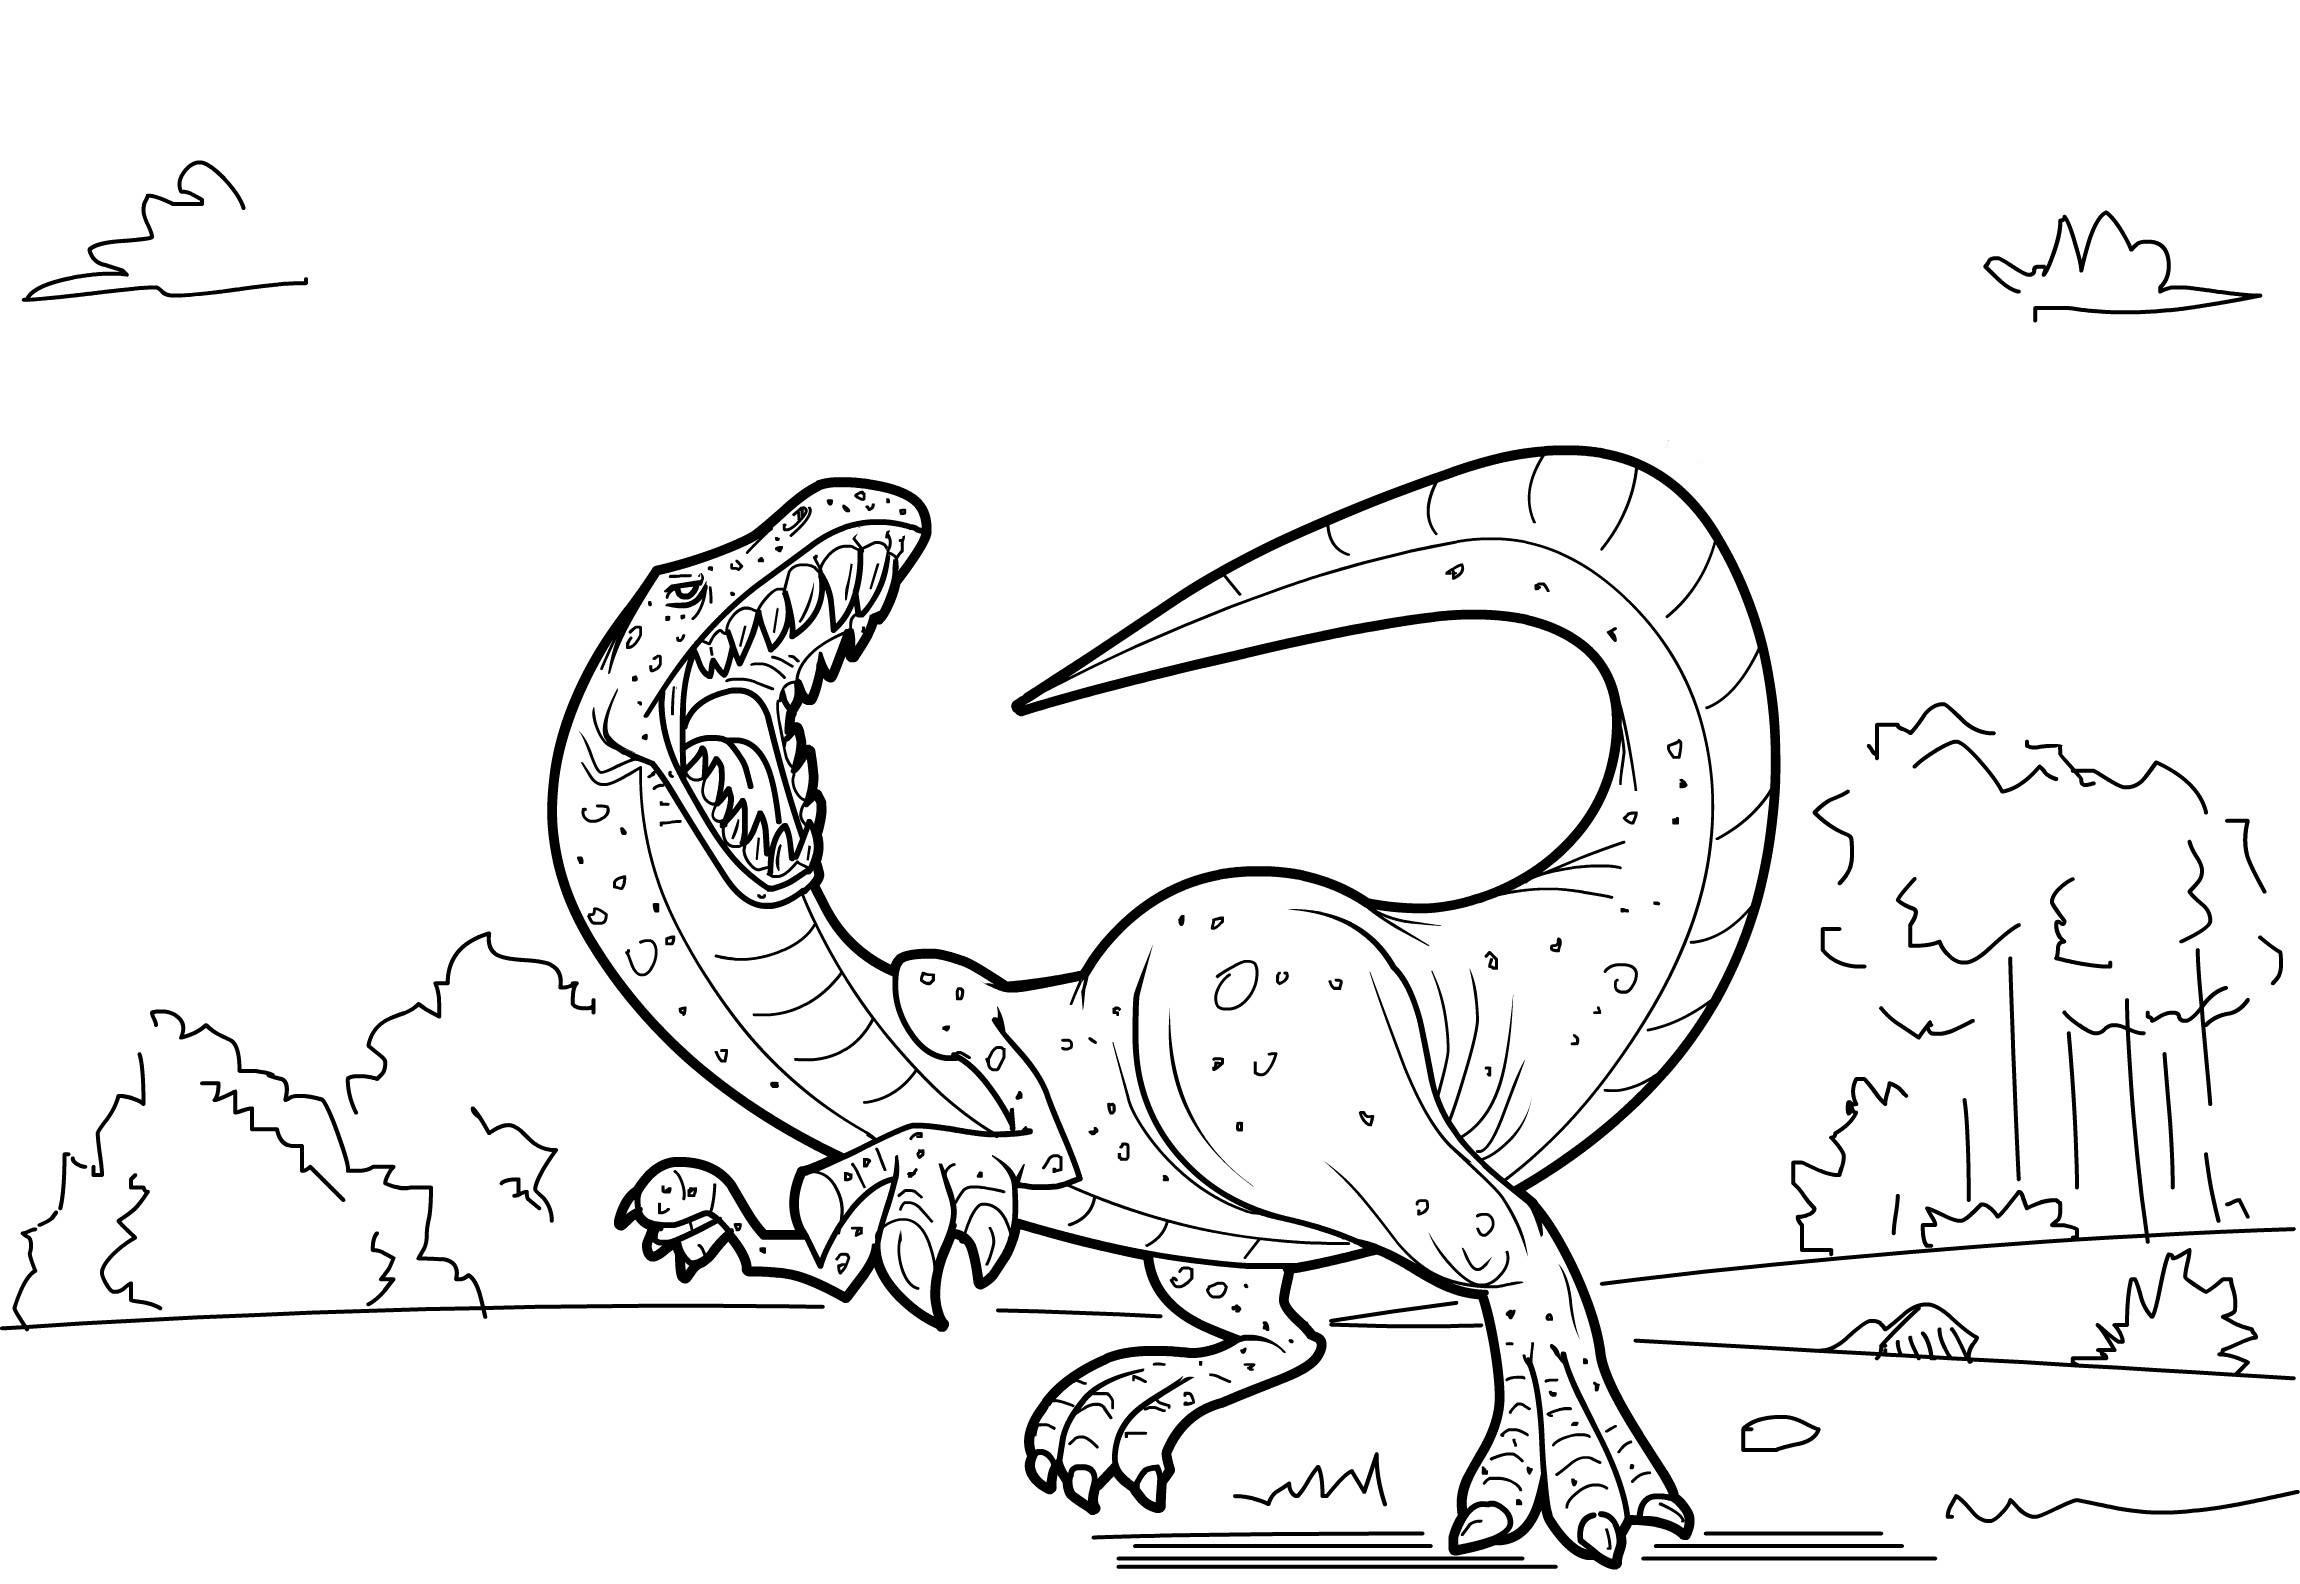 Kids Coloring Pages Dinosaur  Free Printable Dinosaur Coloring Pages For Kids